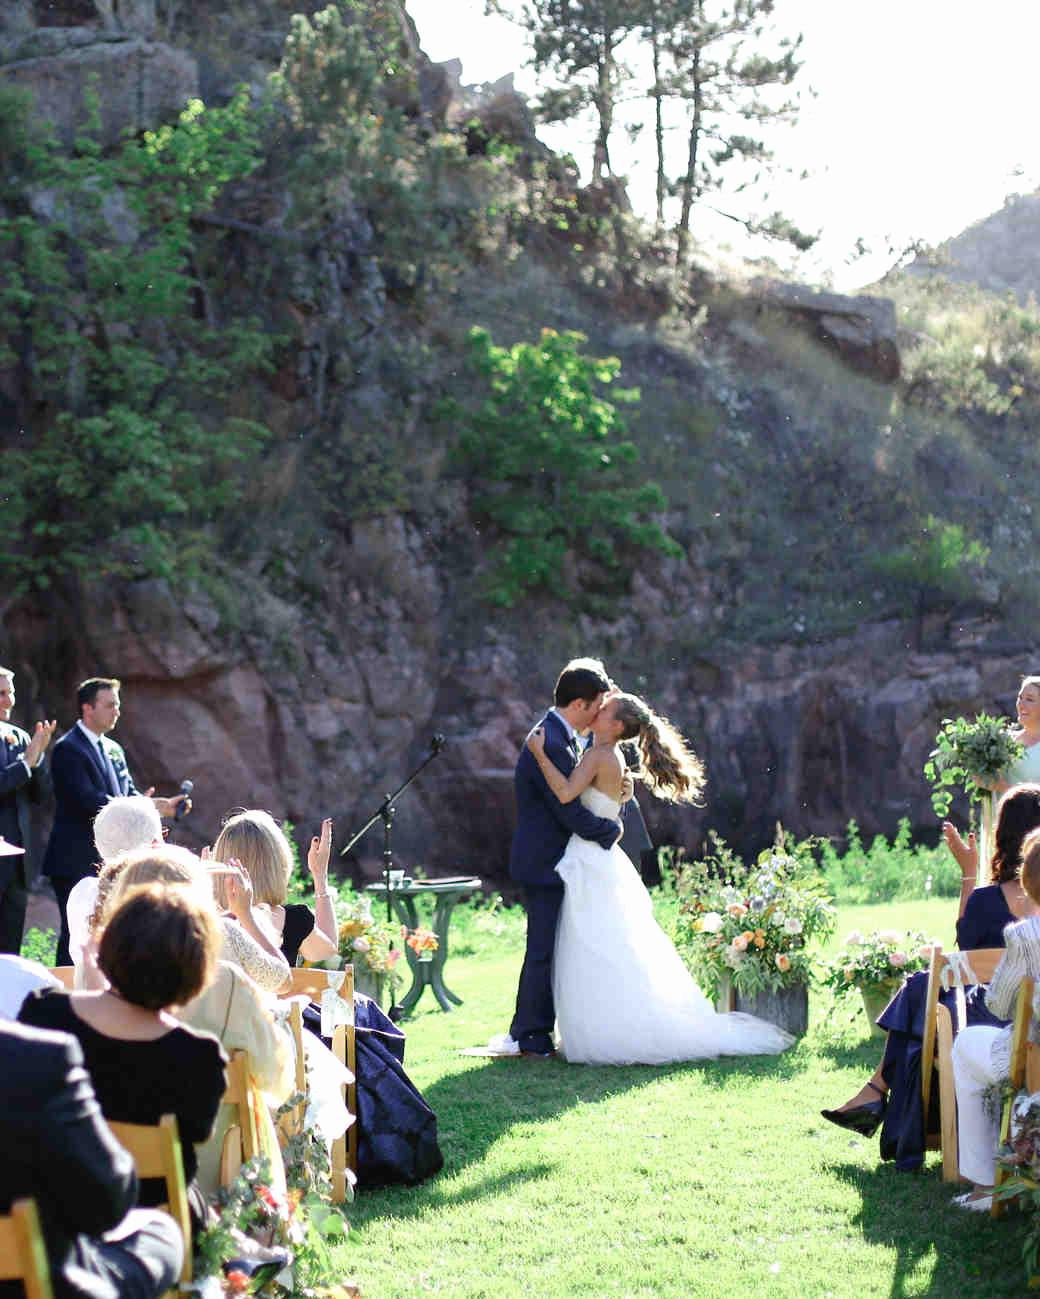 Simple Wedding Ceremony Outline Luxury A Basic Wedding Ceremony Outline for Planning the order Of